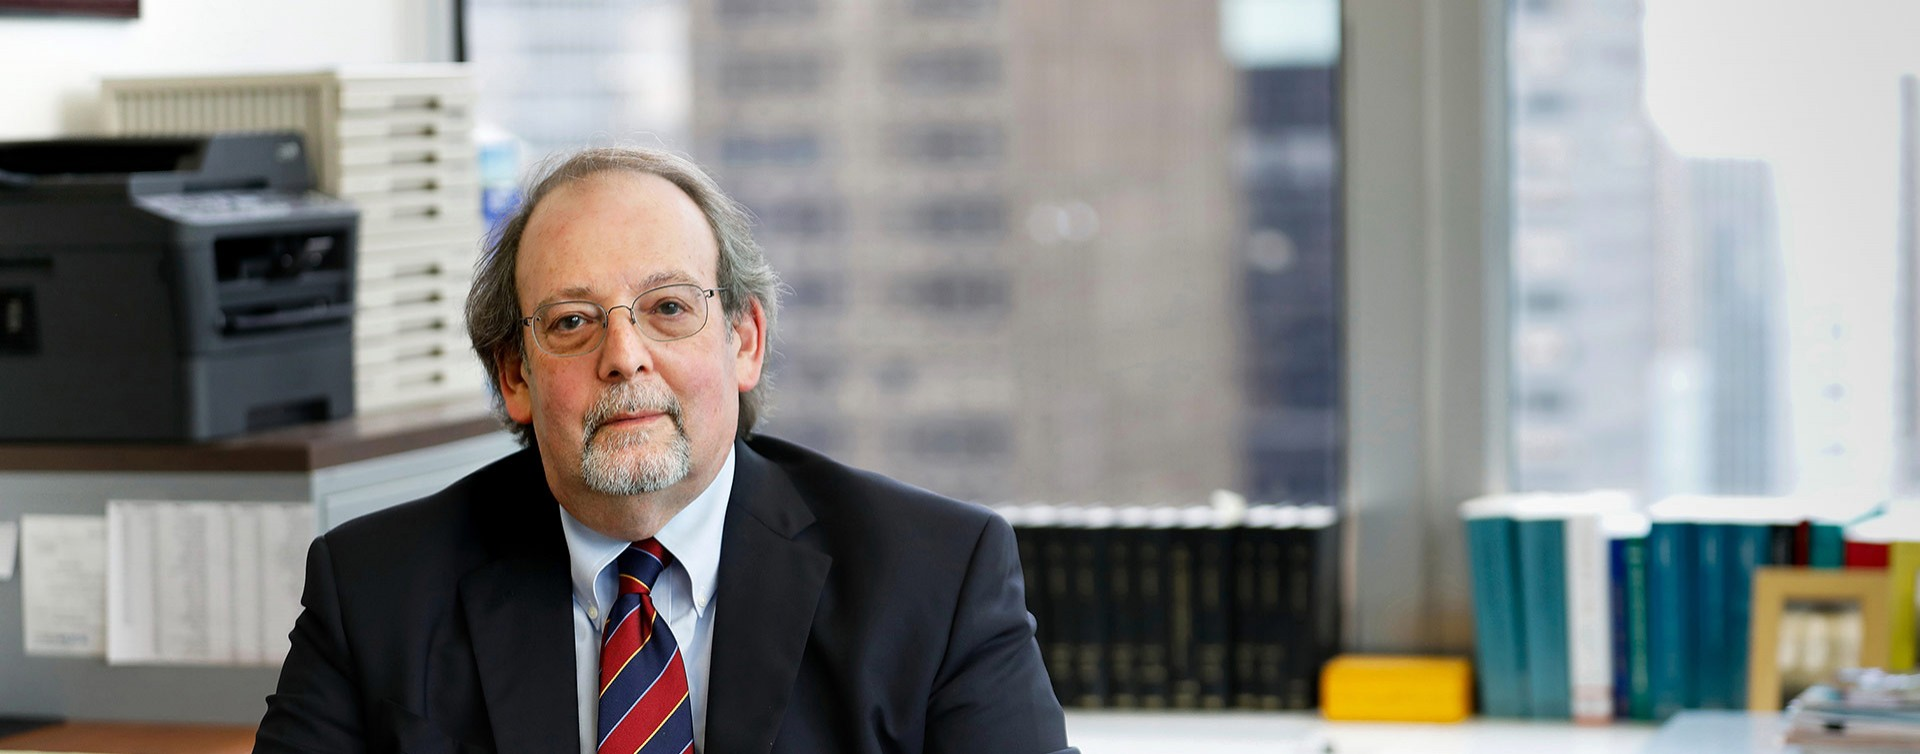 Jeffrey Kehl Labor And Employment Law Lawyer Bond